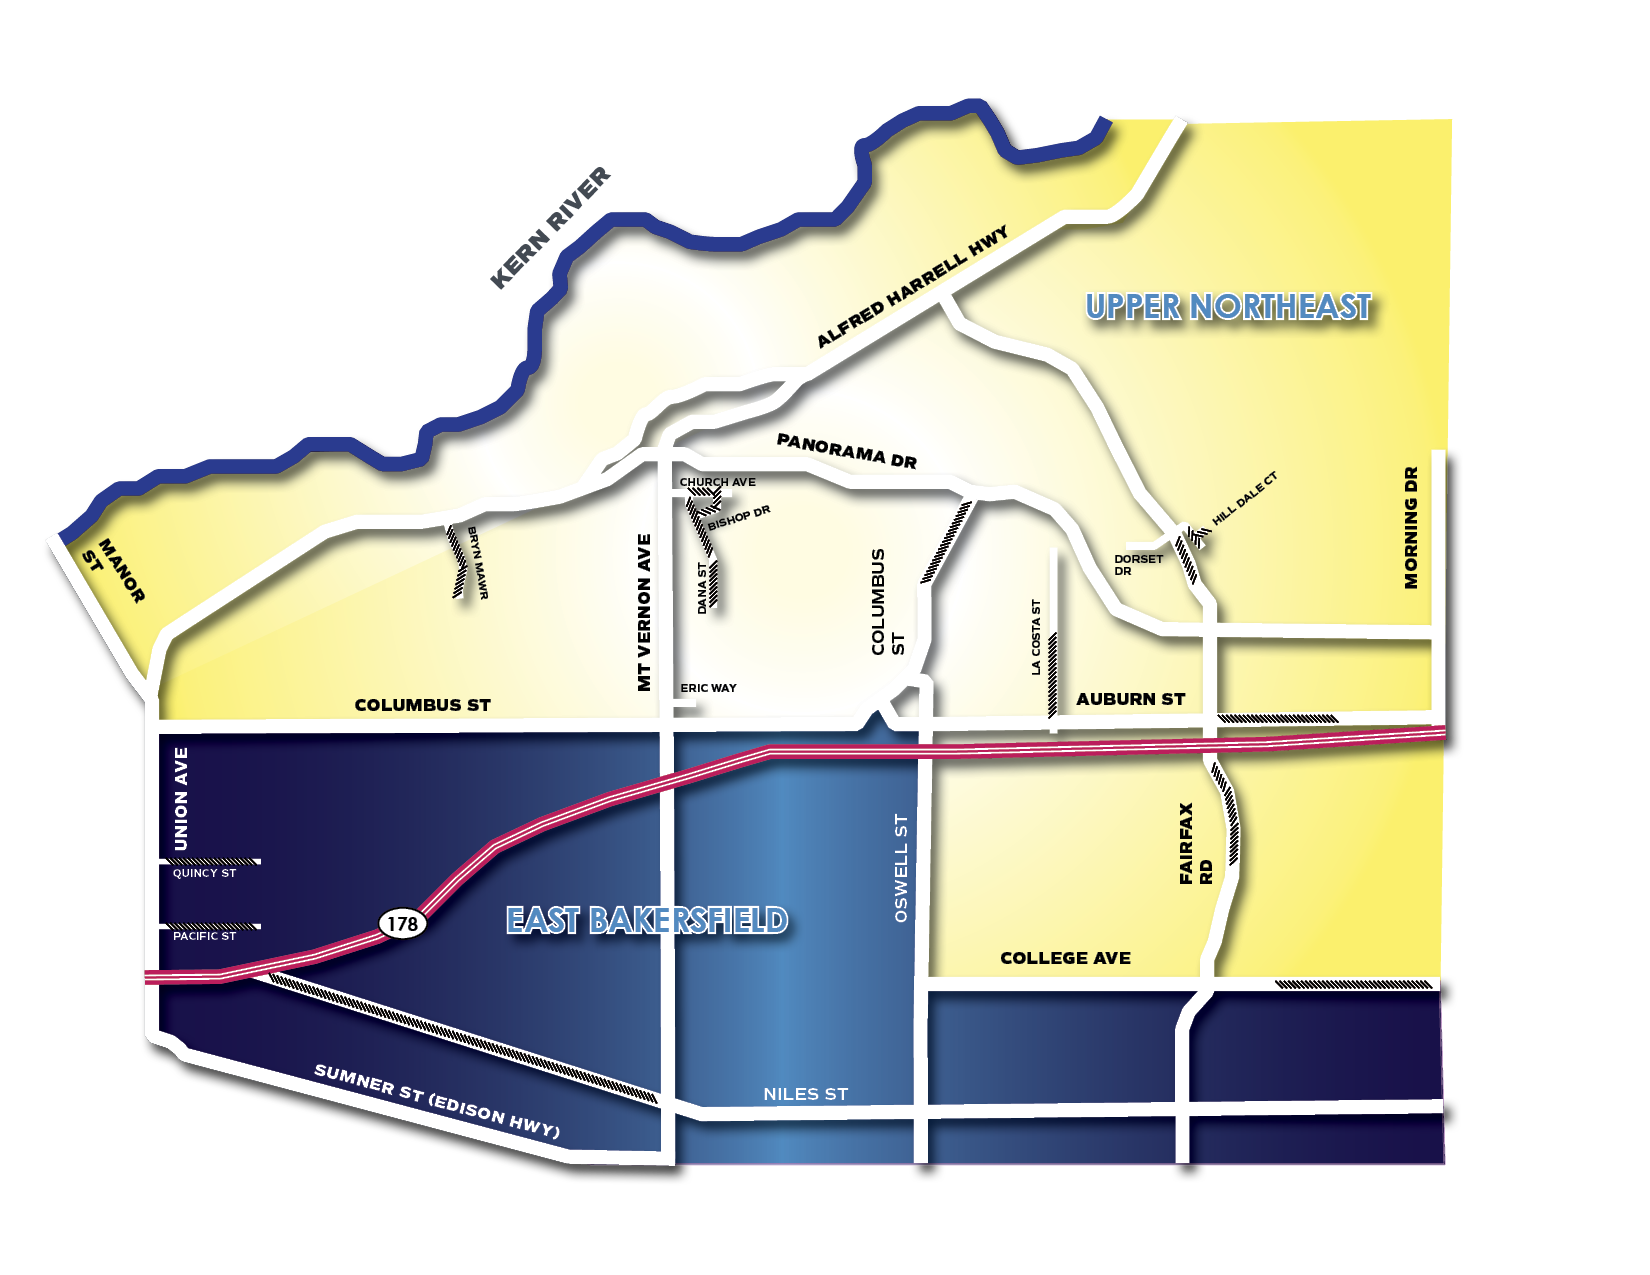 NE Sub Map